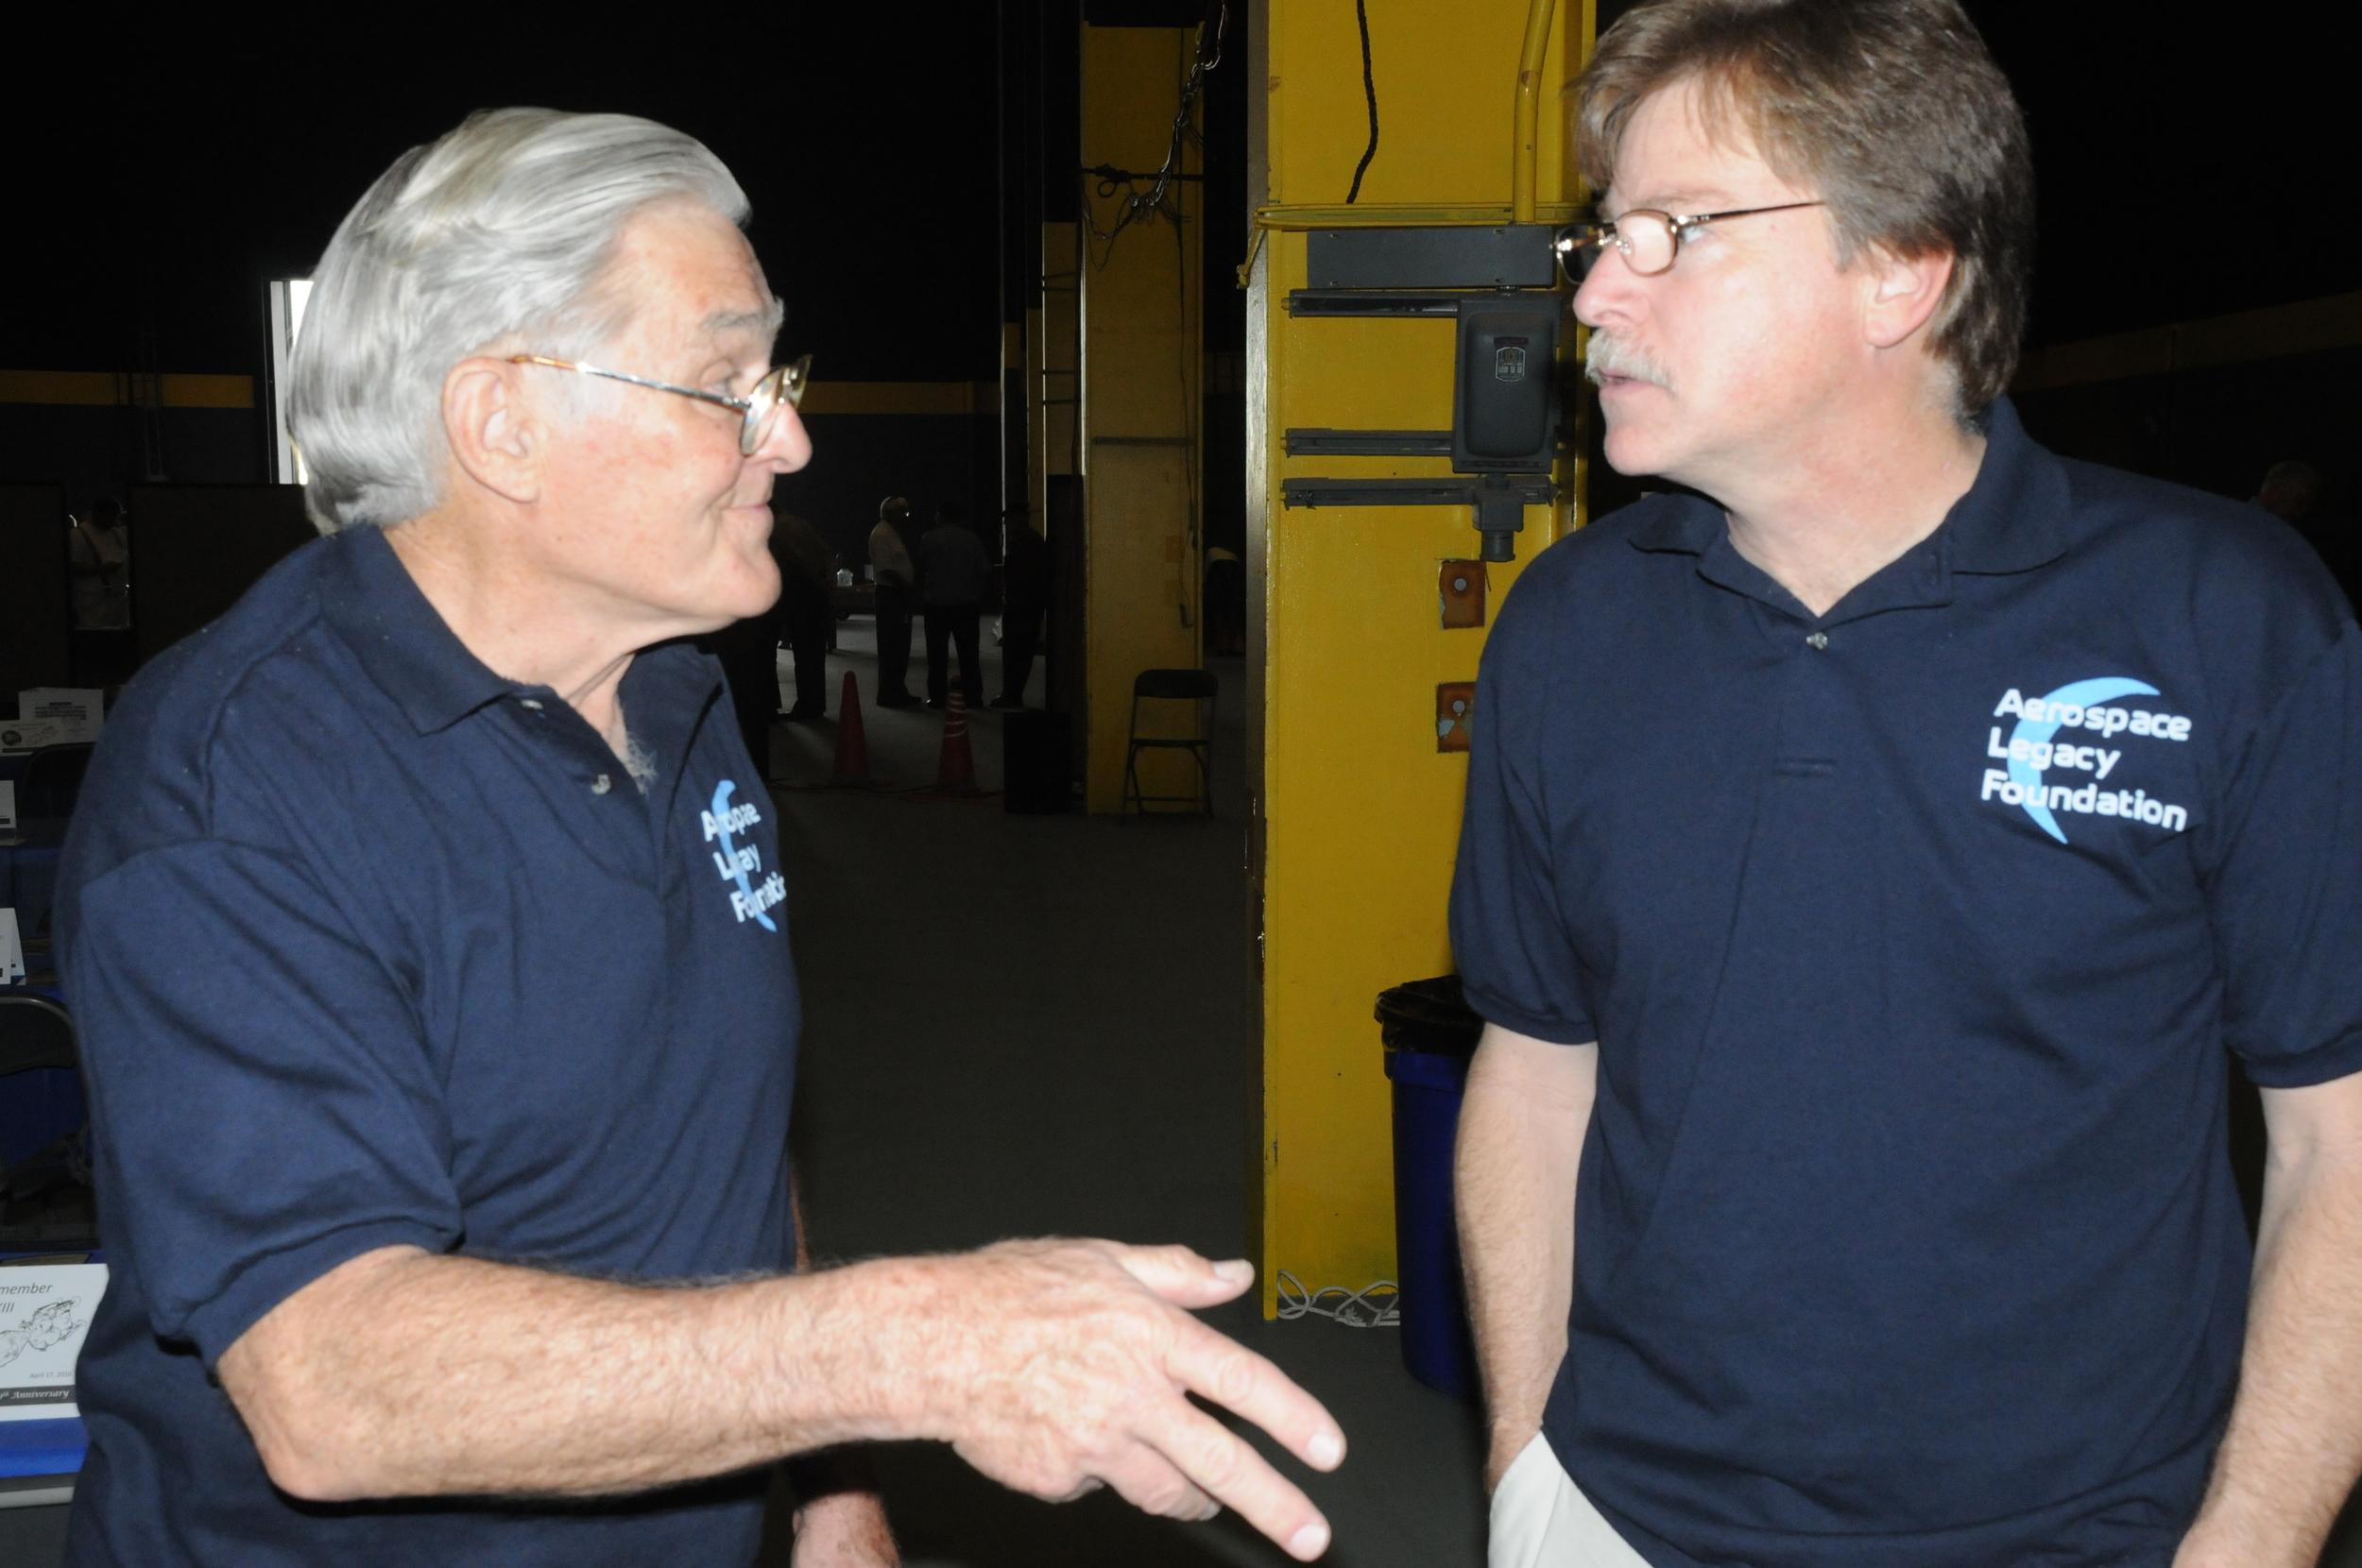 Robert Sechrist and Larry Latimer